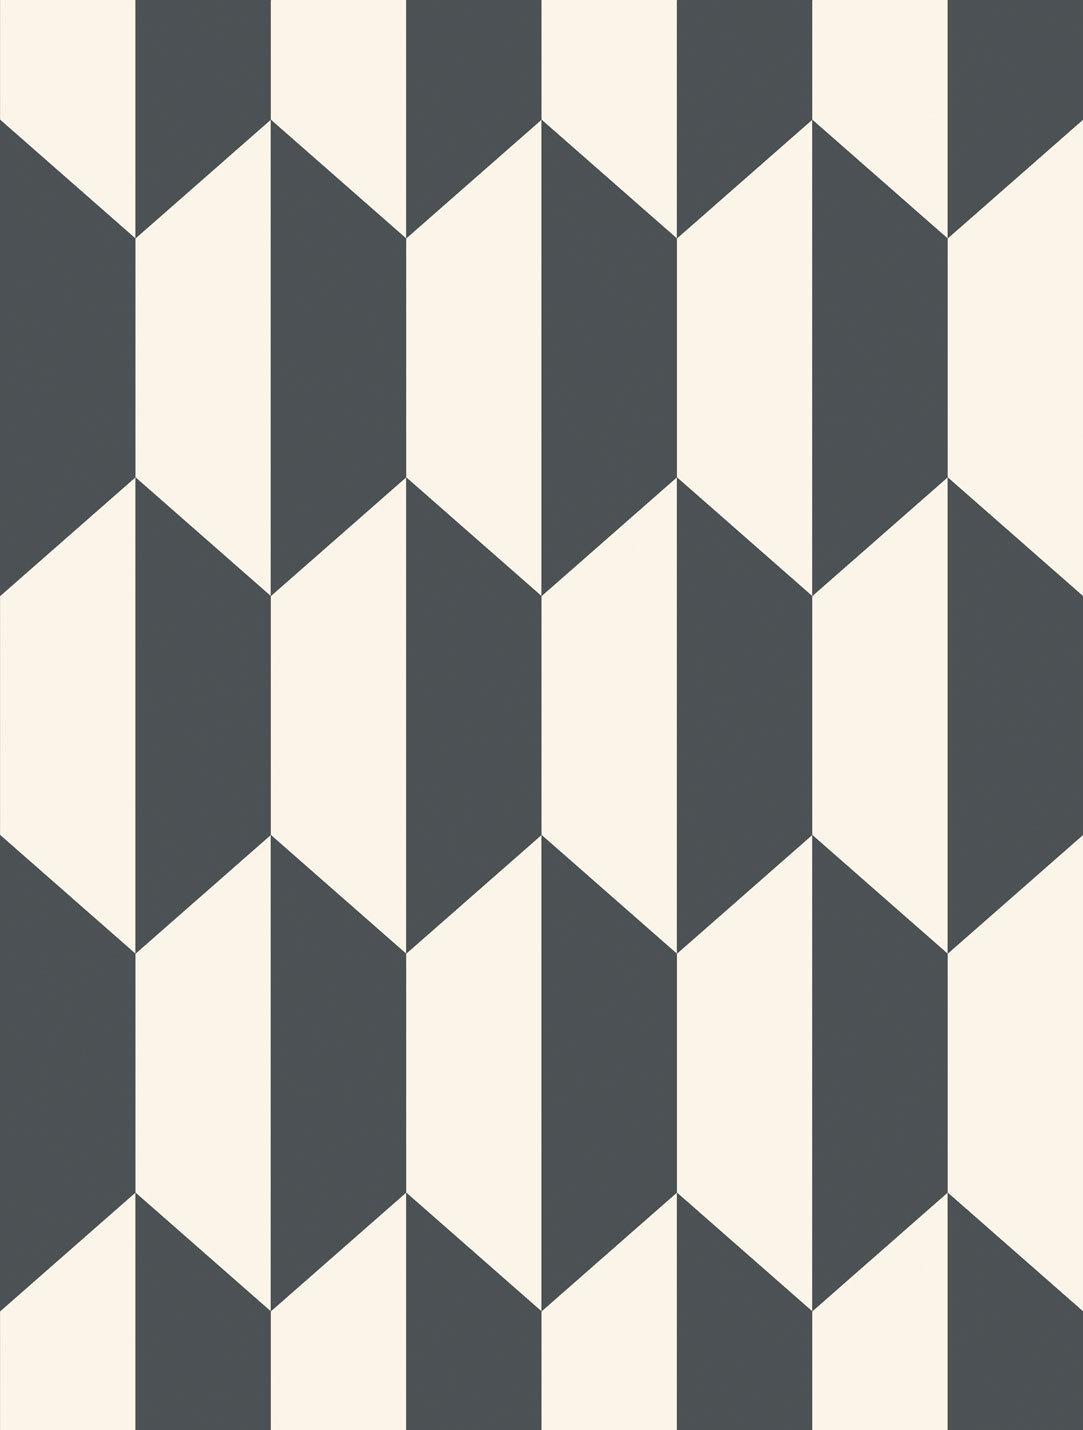 Обои Cole & Son Geometric II 105/12050, интернет магазин Волео